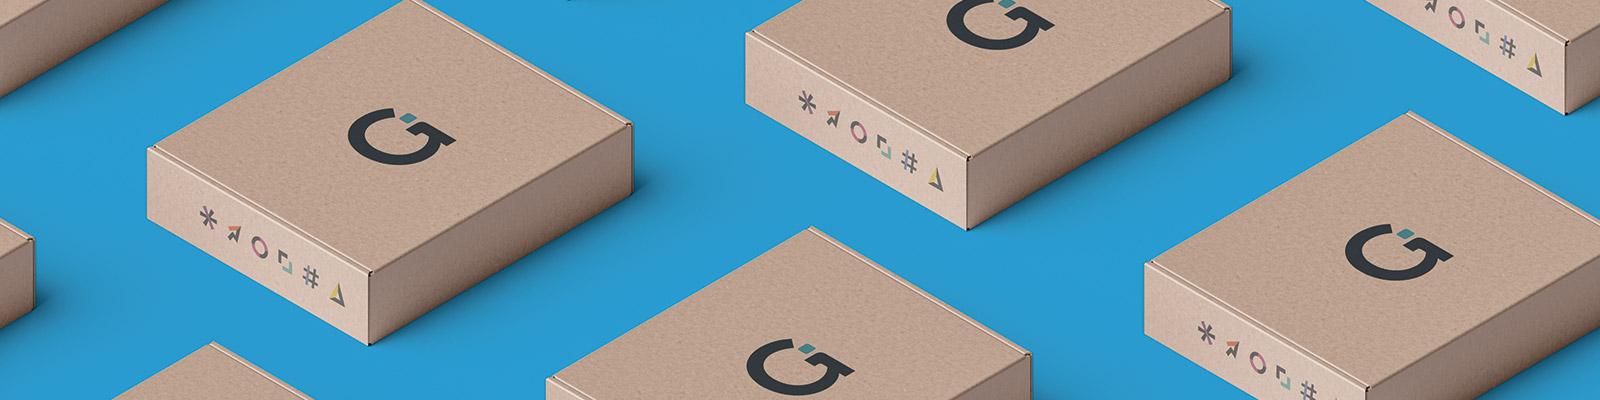 Design graphique - Packaging